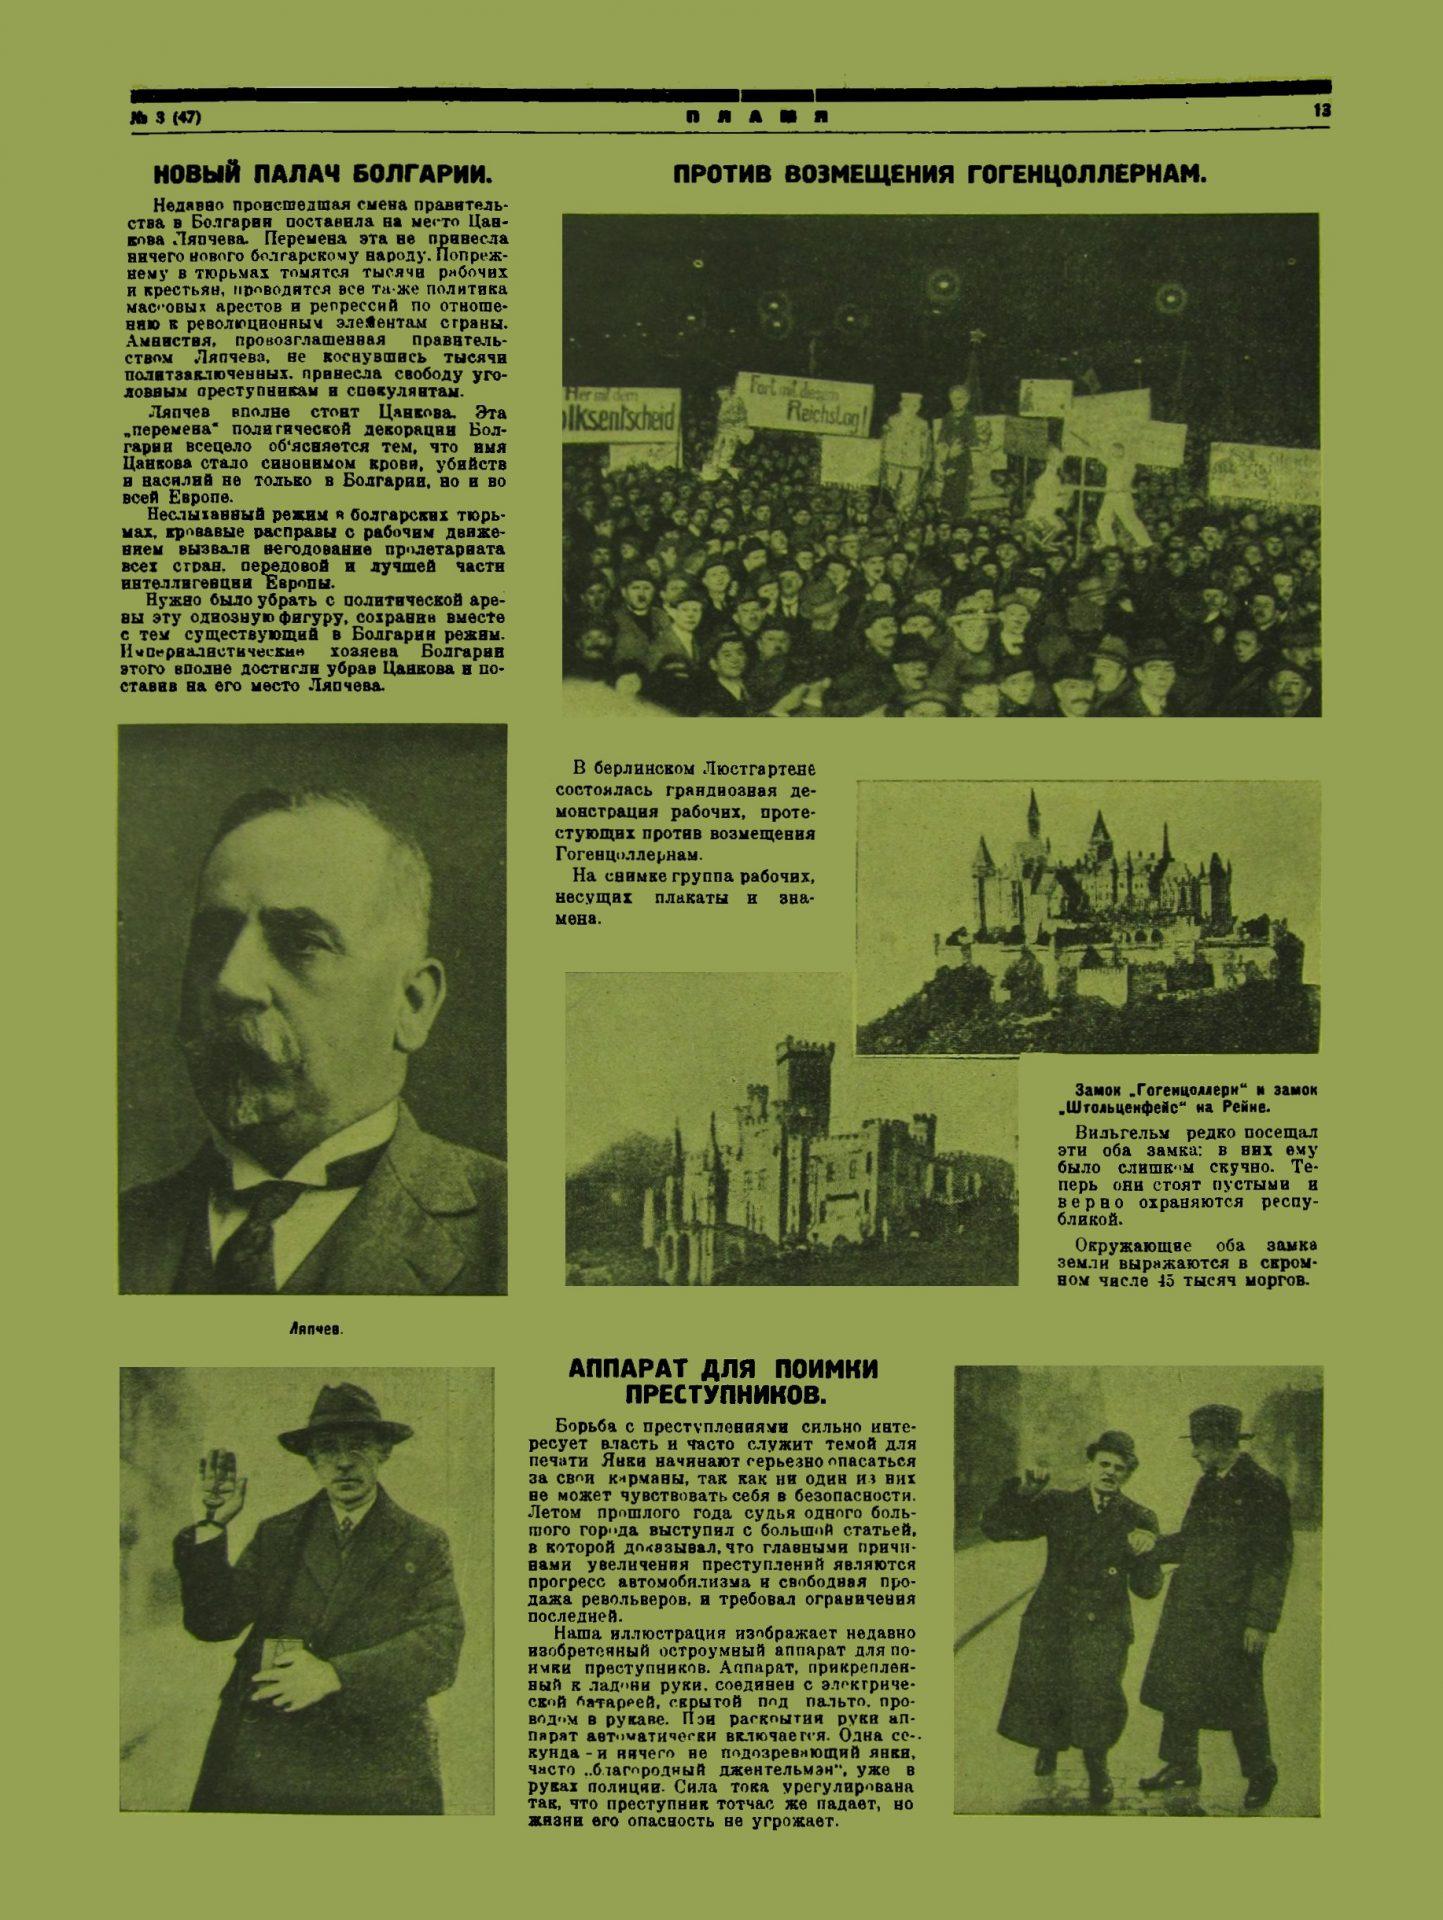 Пламя_1926_№3